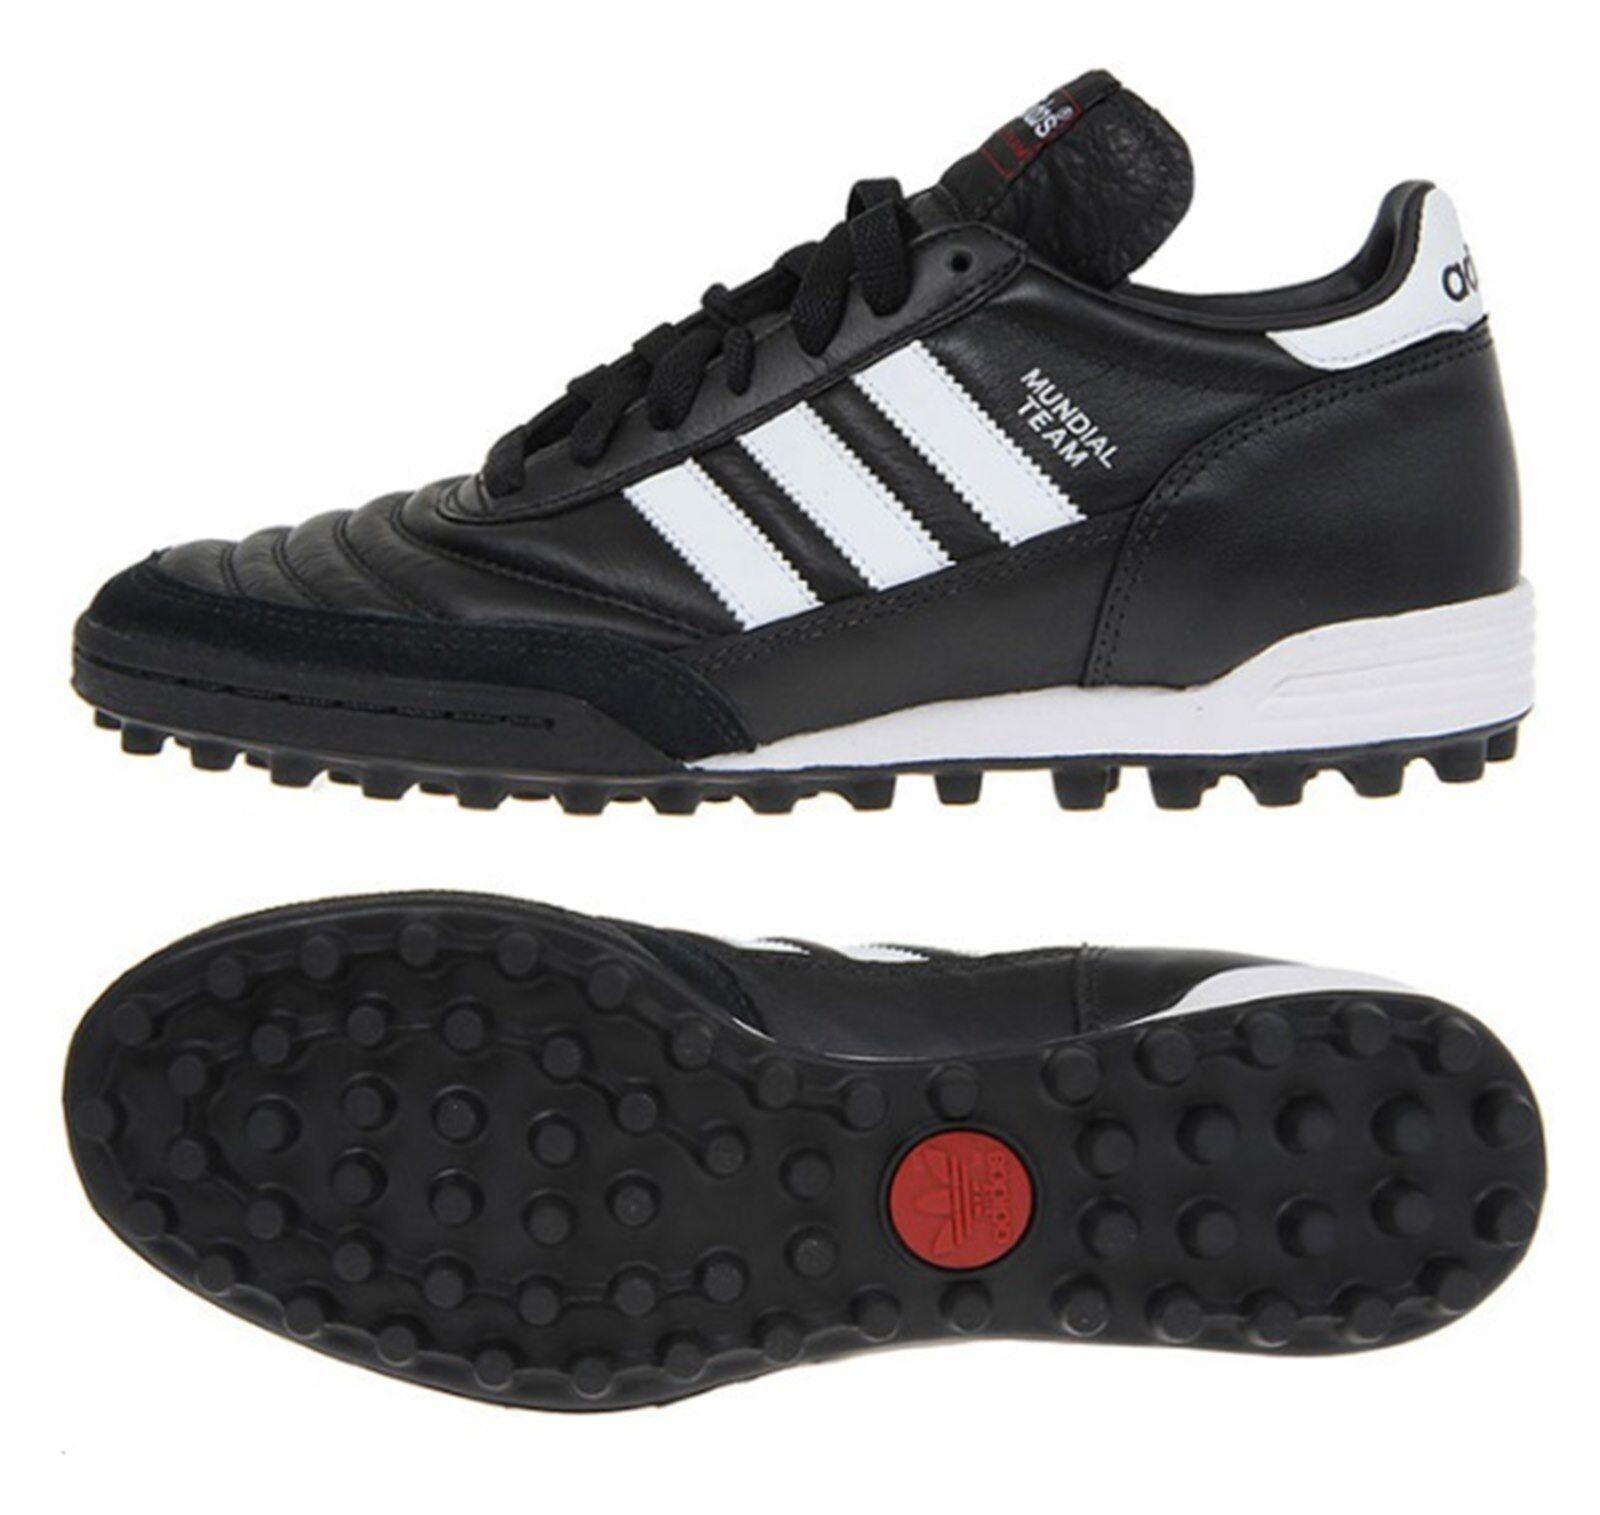 Adidas mannen Mundial Team TURF Cleats Futsal zwart wit schoenen Voetbal Spike 019228